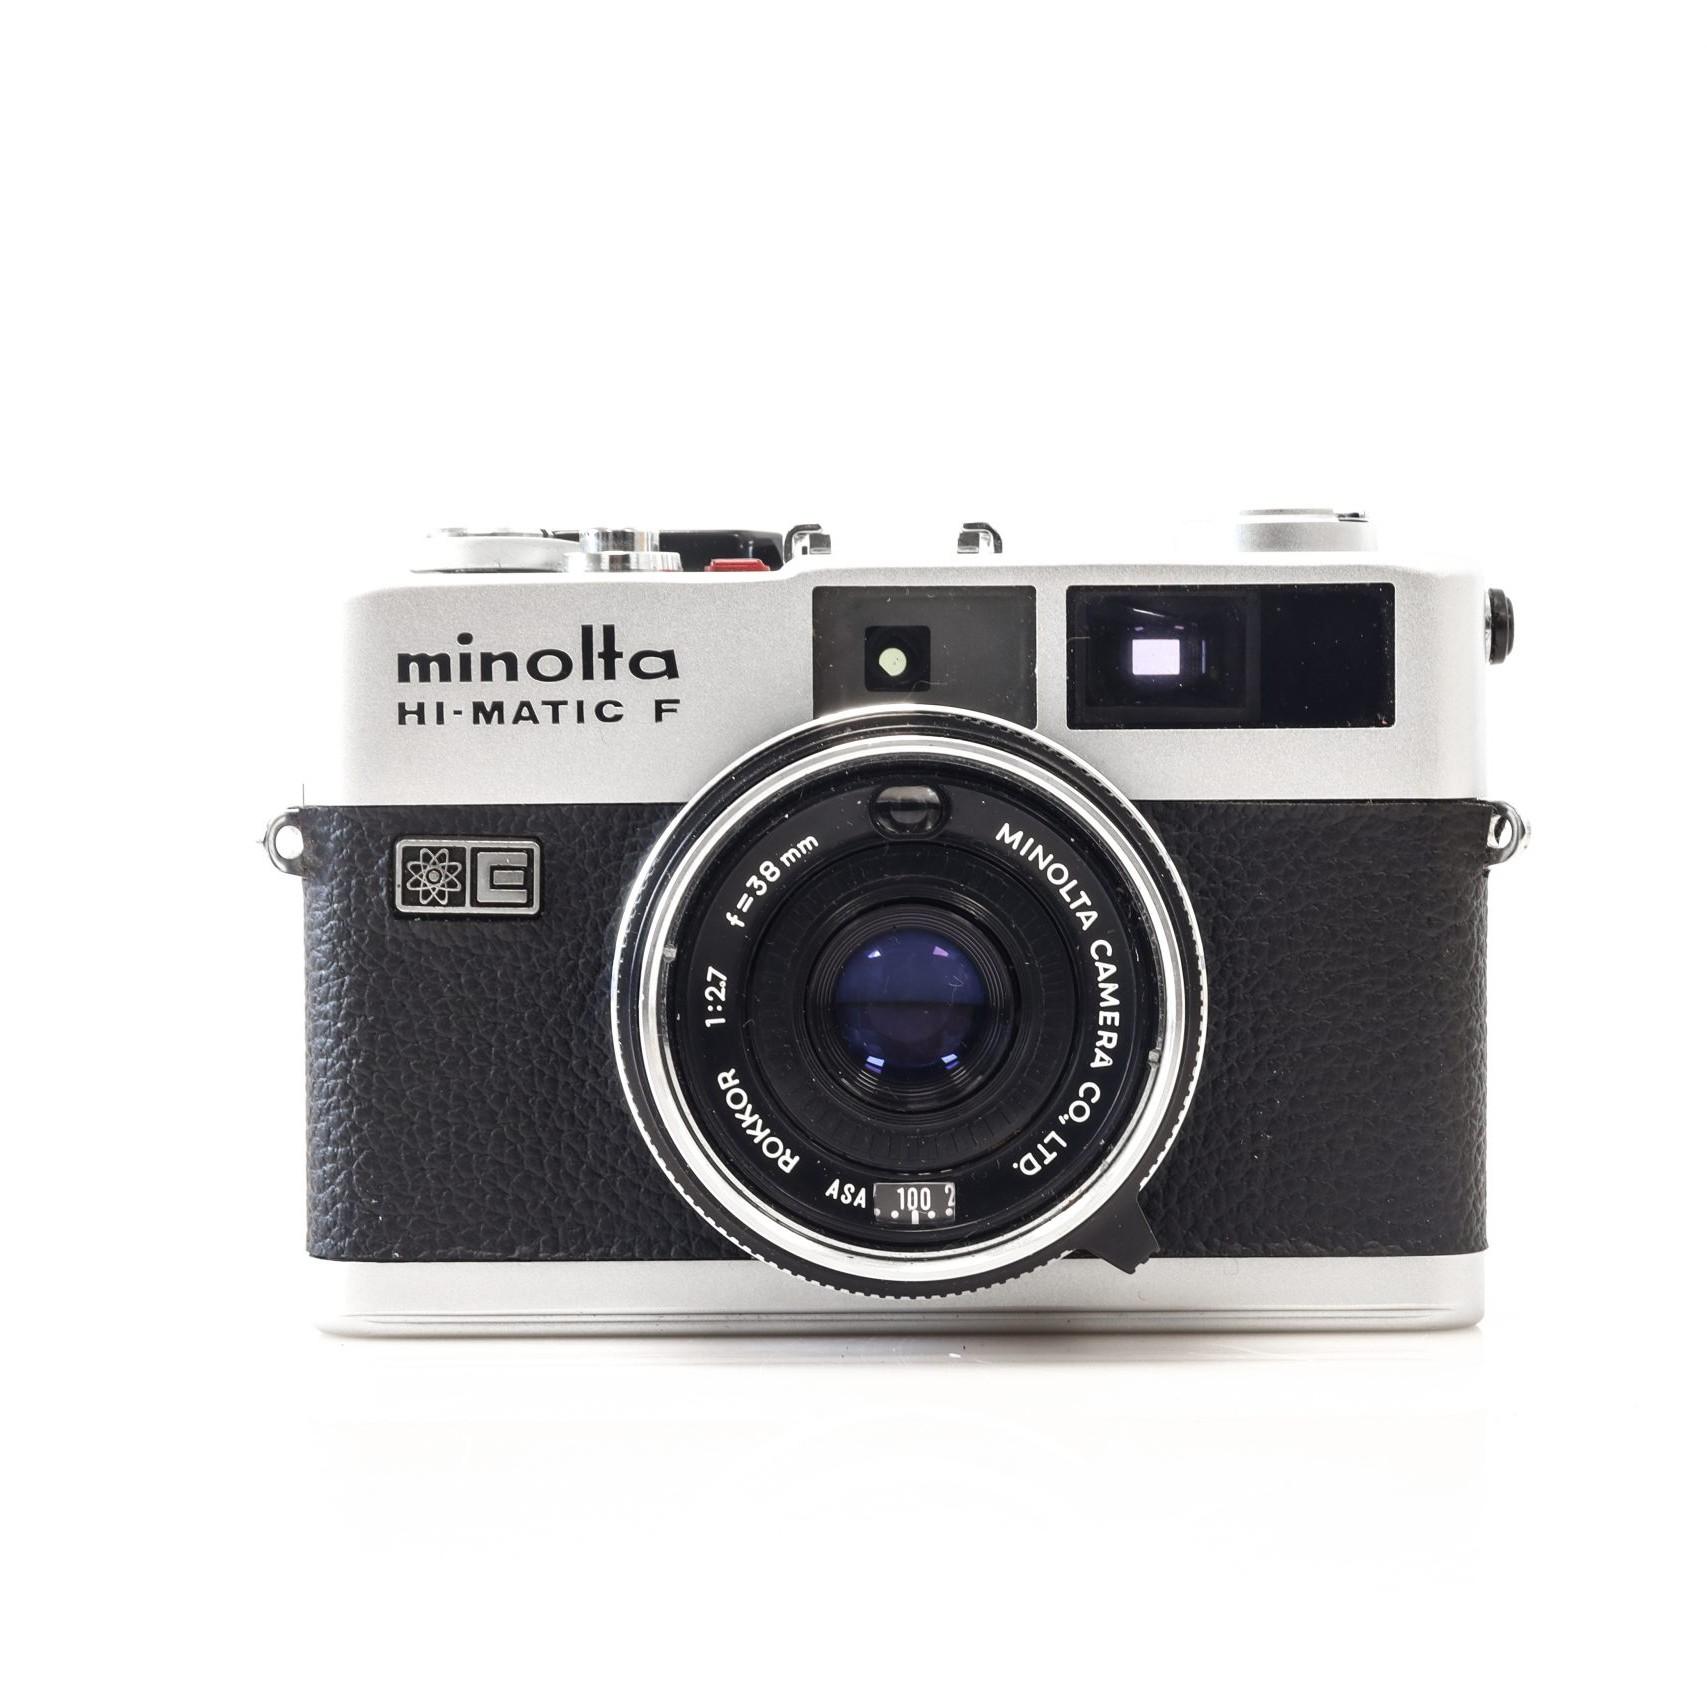 Gorgeous Minolta Hi - Matic F 35mm Rangefinder Camera